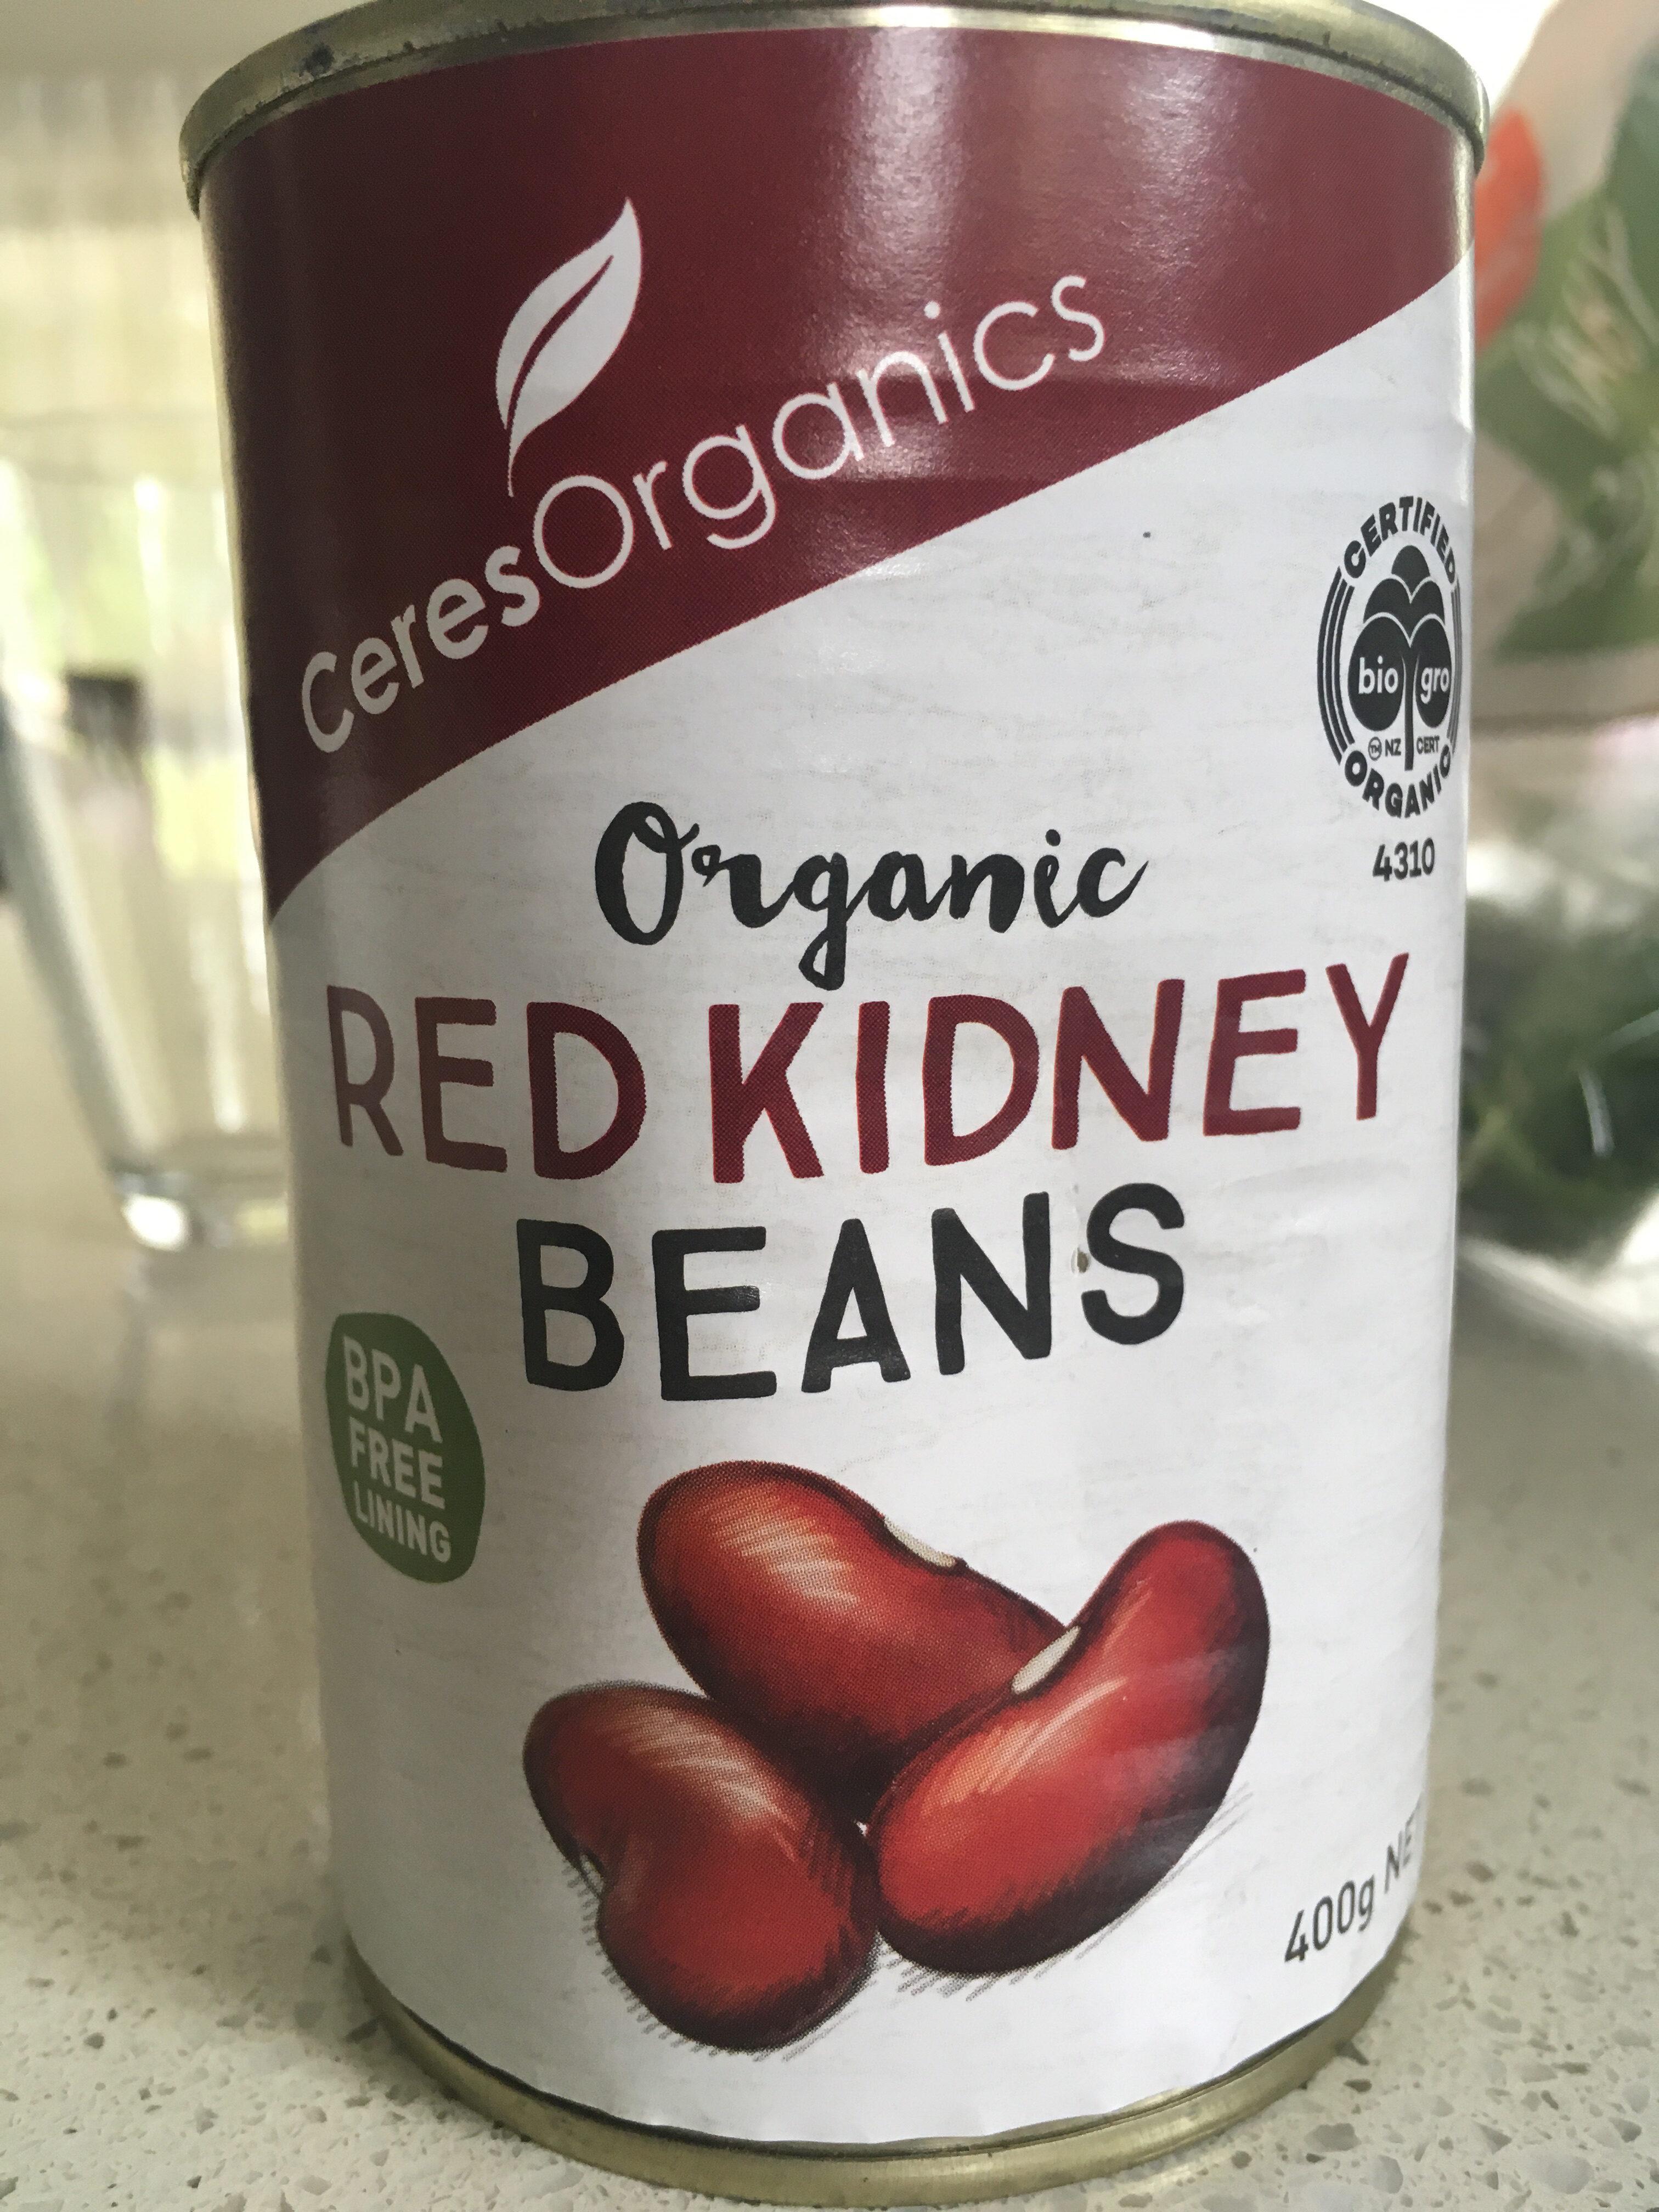 Organic Red Kidney Beans - Product - en